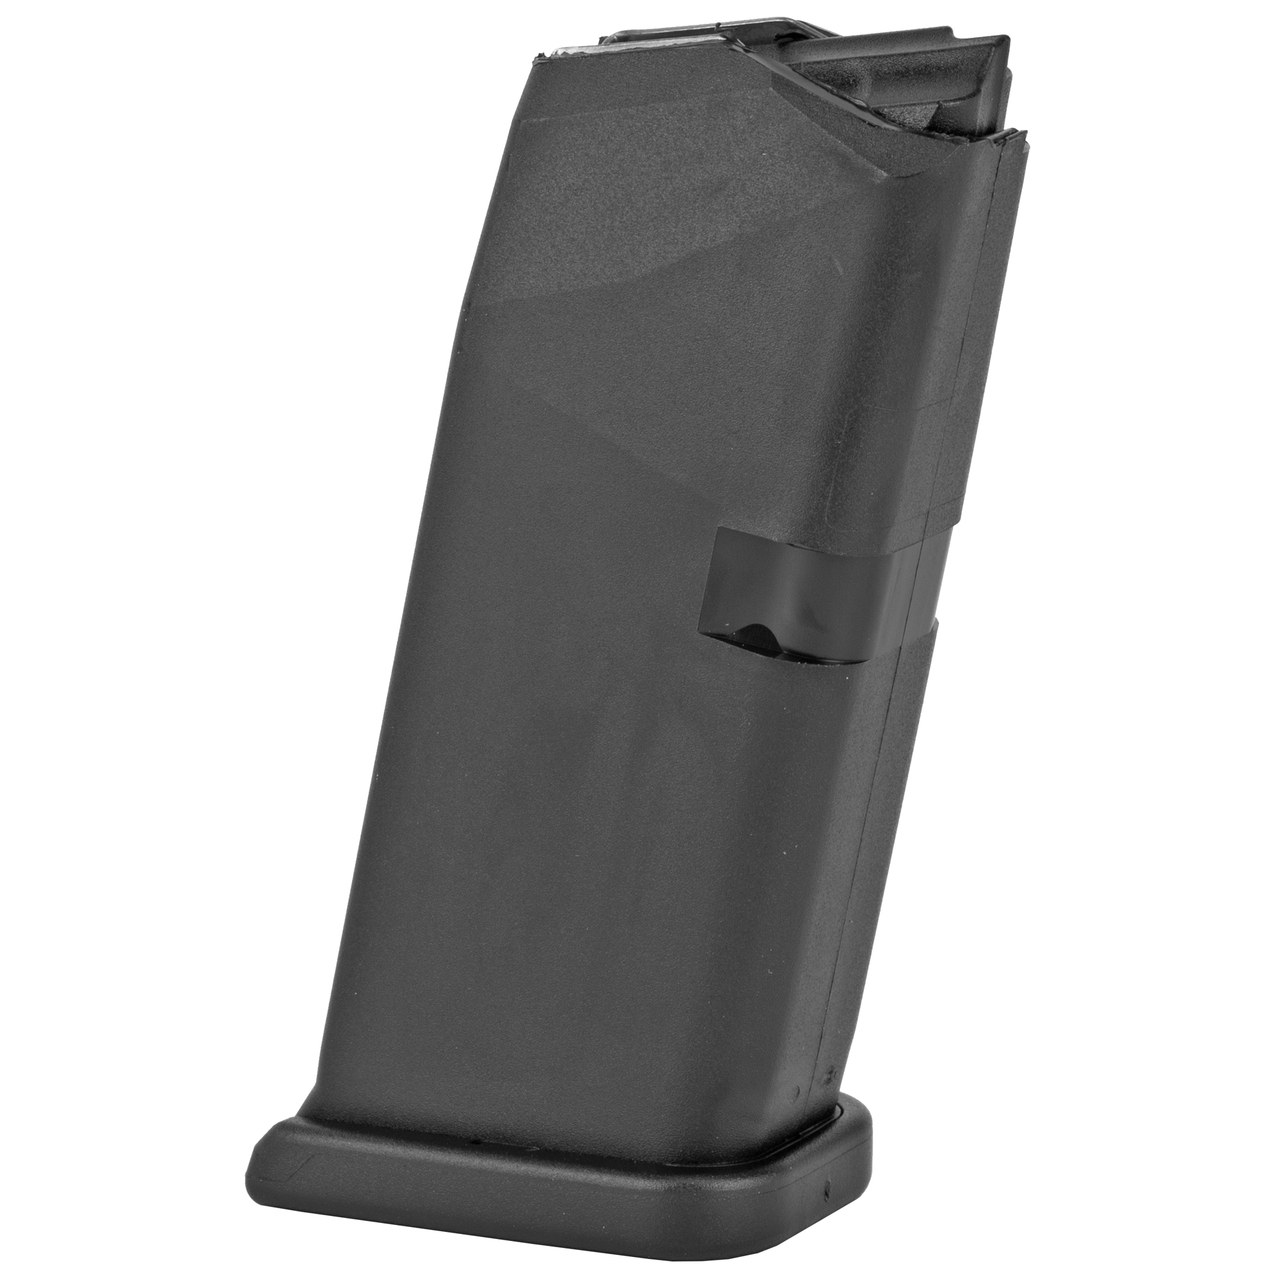 Glock OEM G26 9mm 10rd Magazine